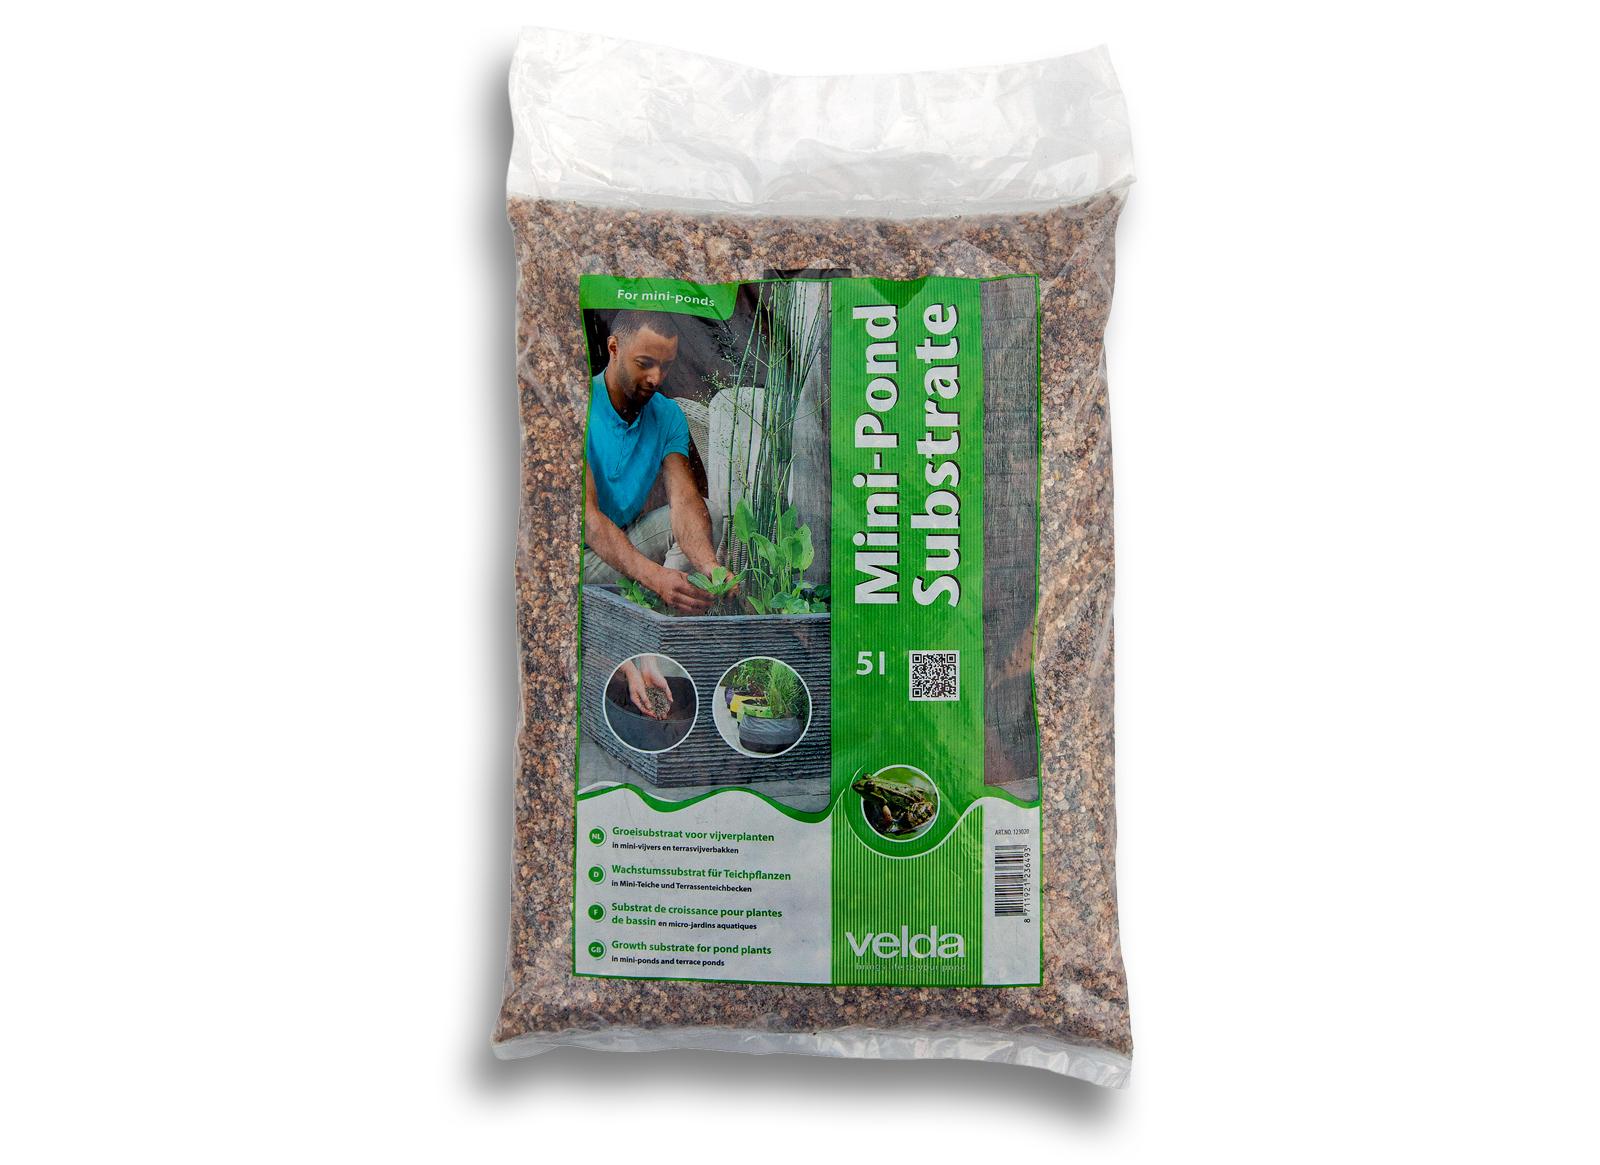 tt2 1 l velda miniteich substrat 5 l pflanzsubstrat substrat pflanzen miniteich ebay. Black Bedroom Furniture Sets. Home Design Ideas